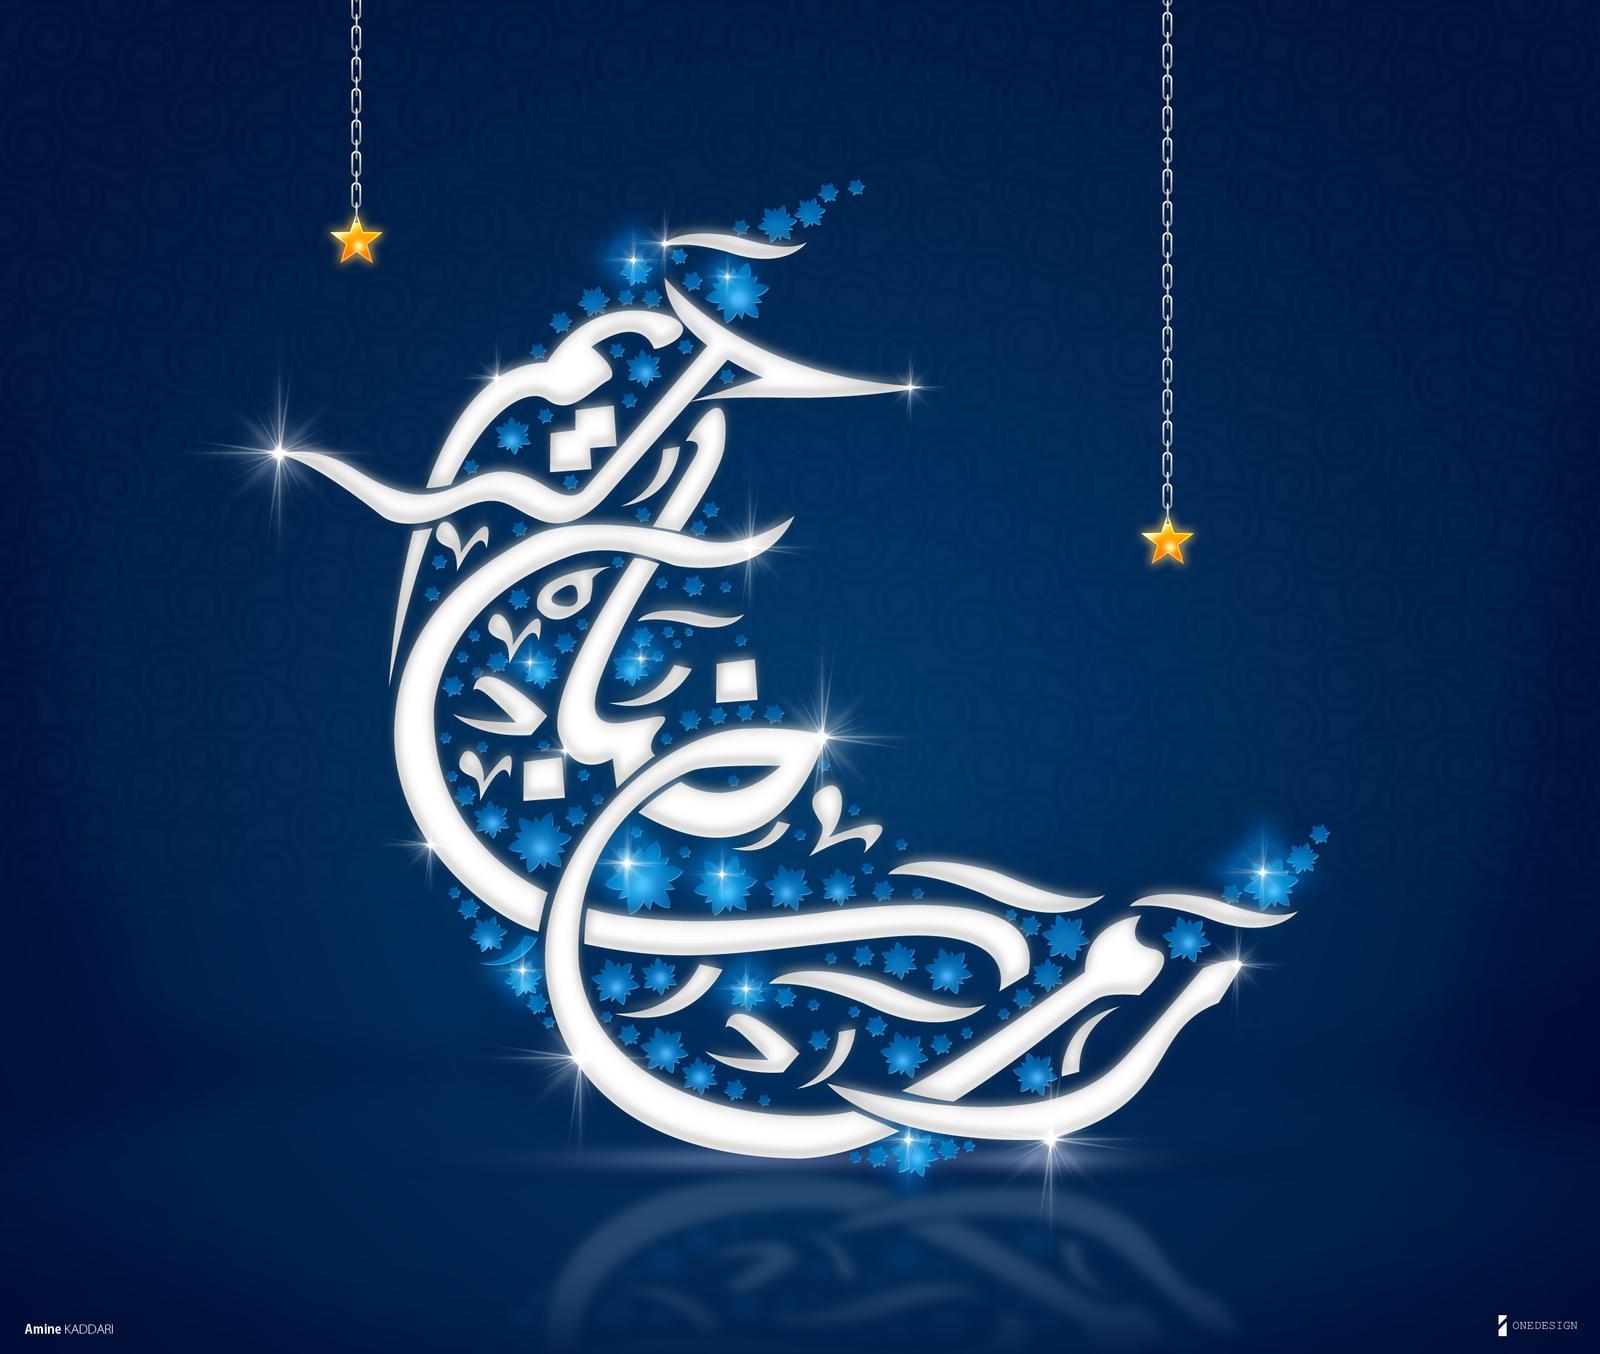 Ramadan 2012 by imonedesign